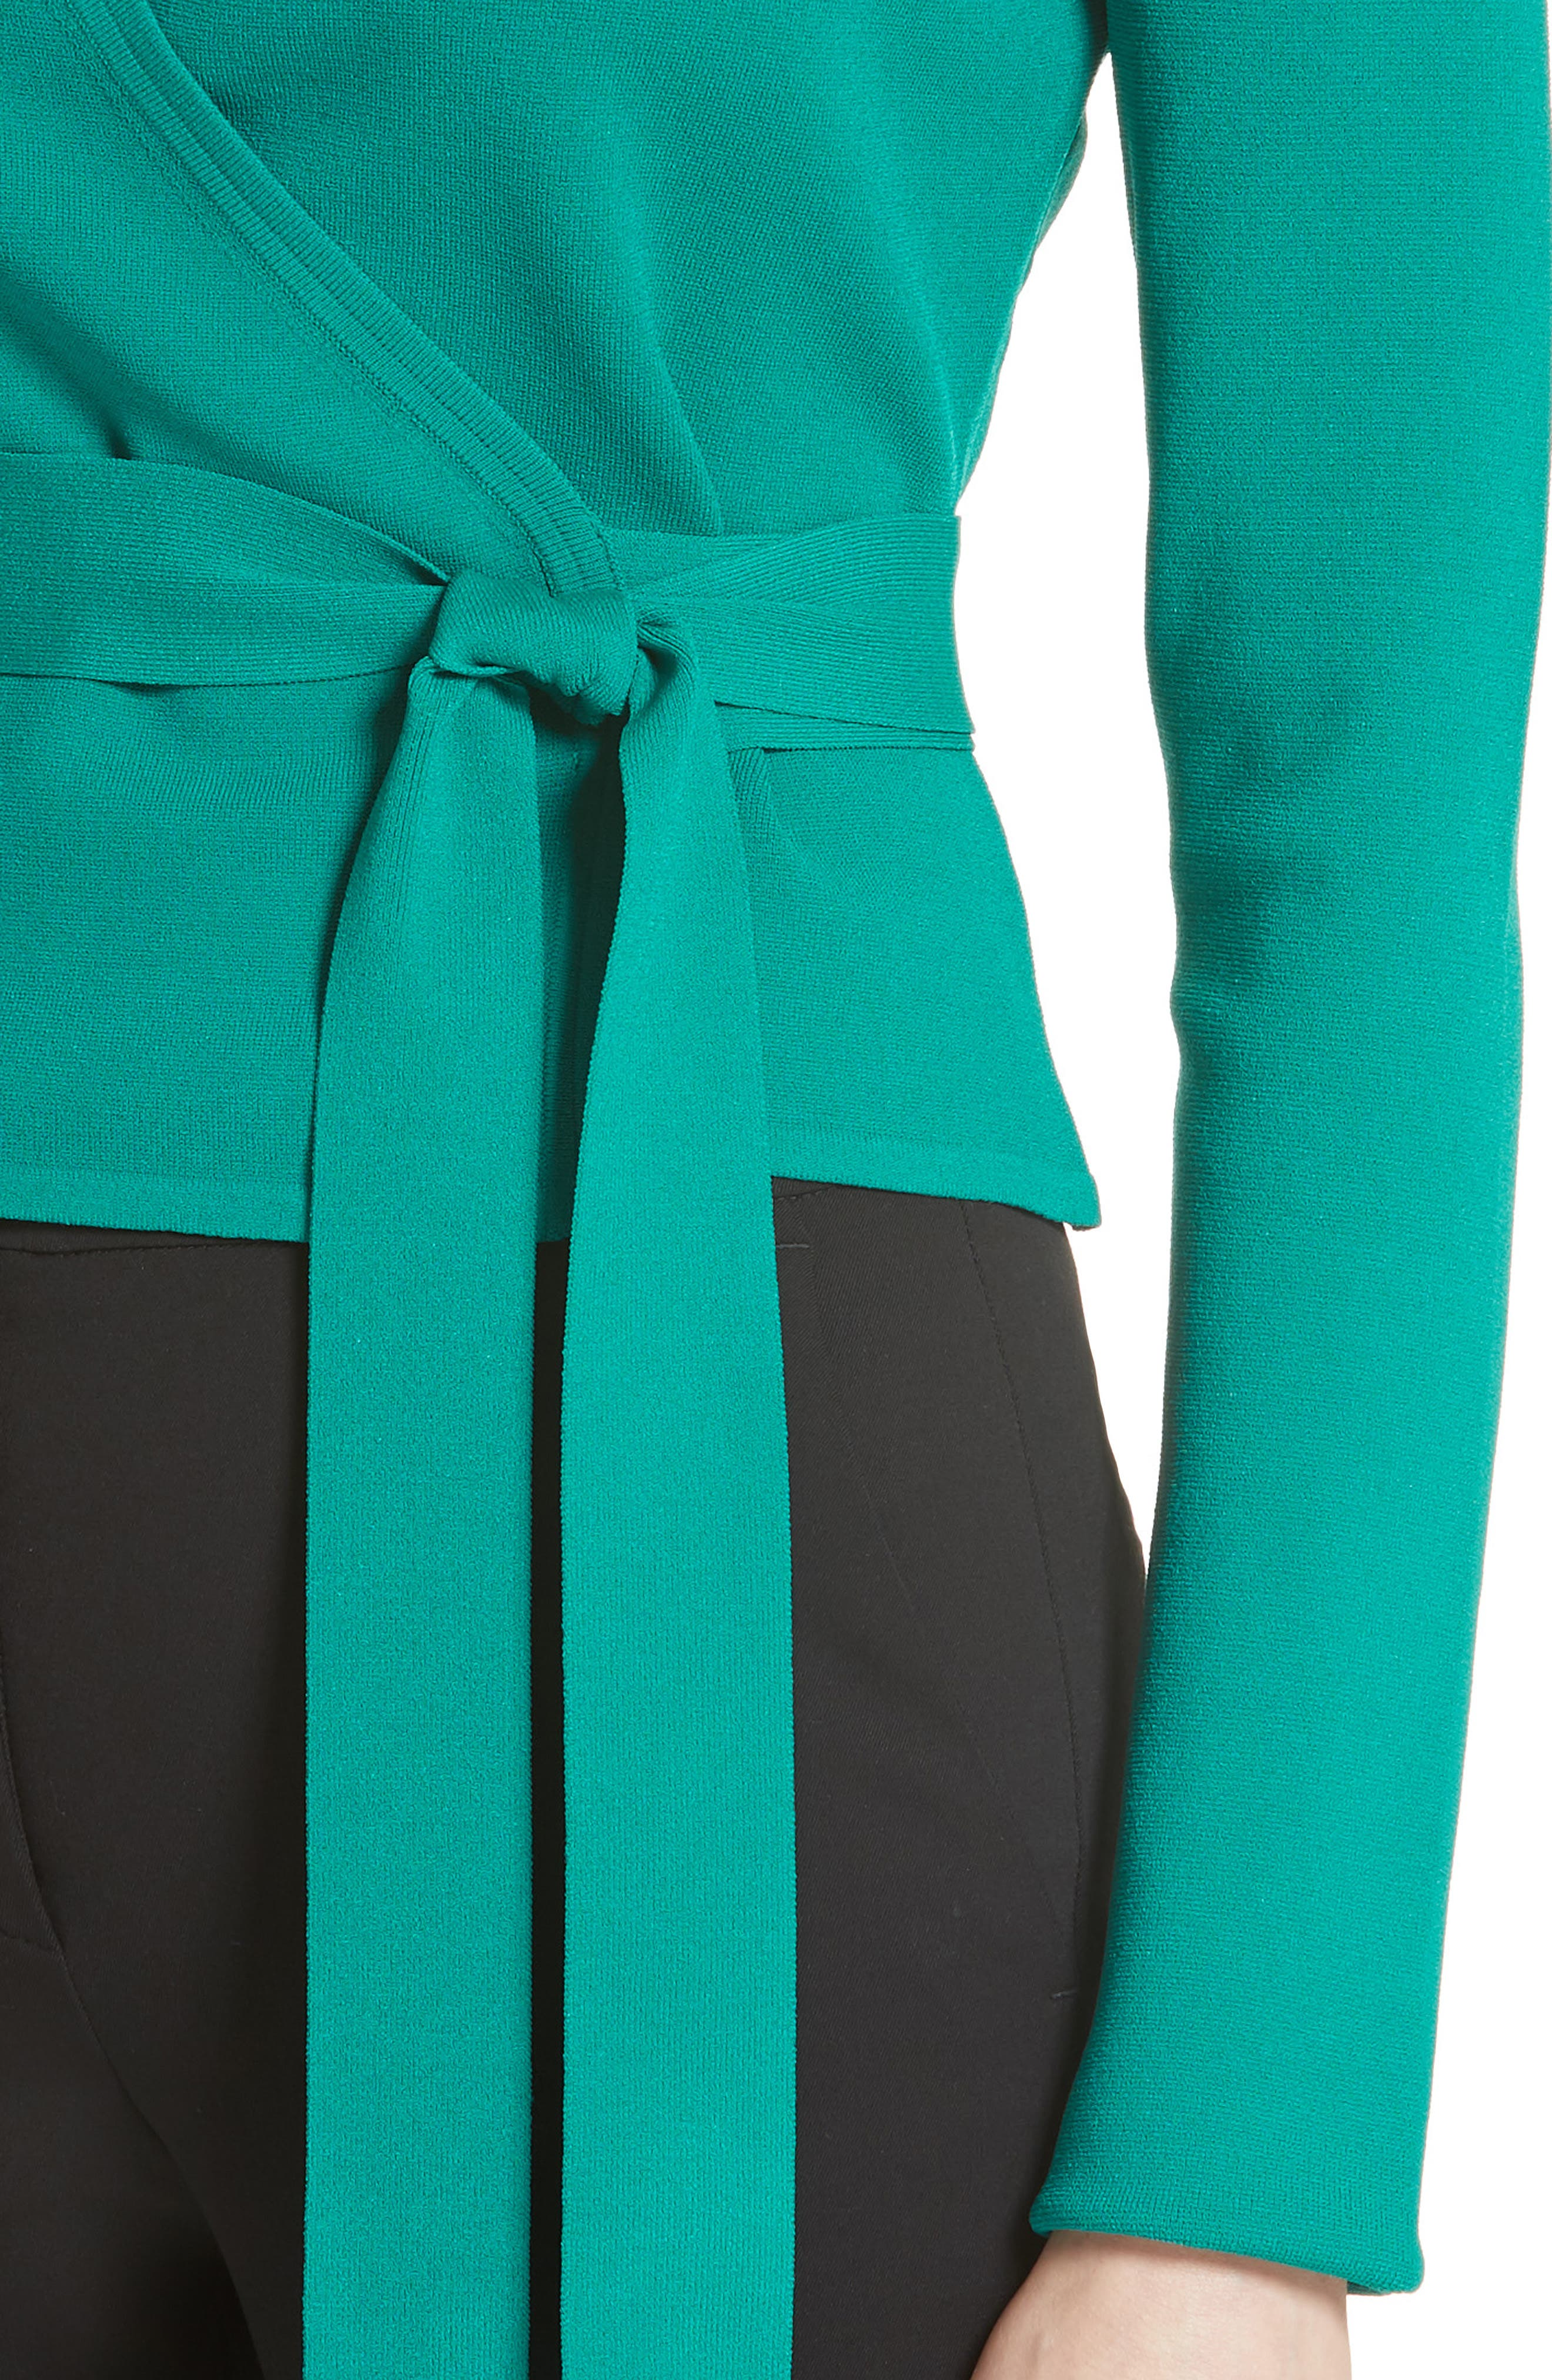 Diane von Furstenberg Knit Wrap Top,                             Alternate thumbnail 4, color,                             340